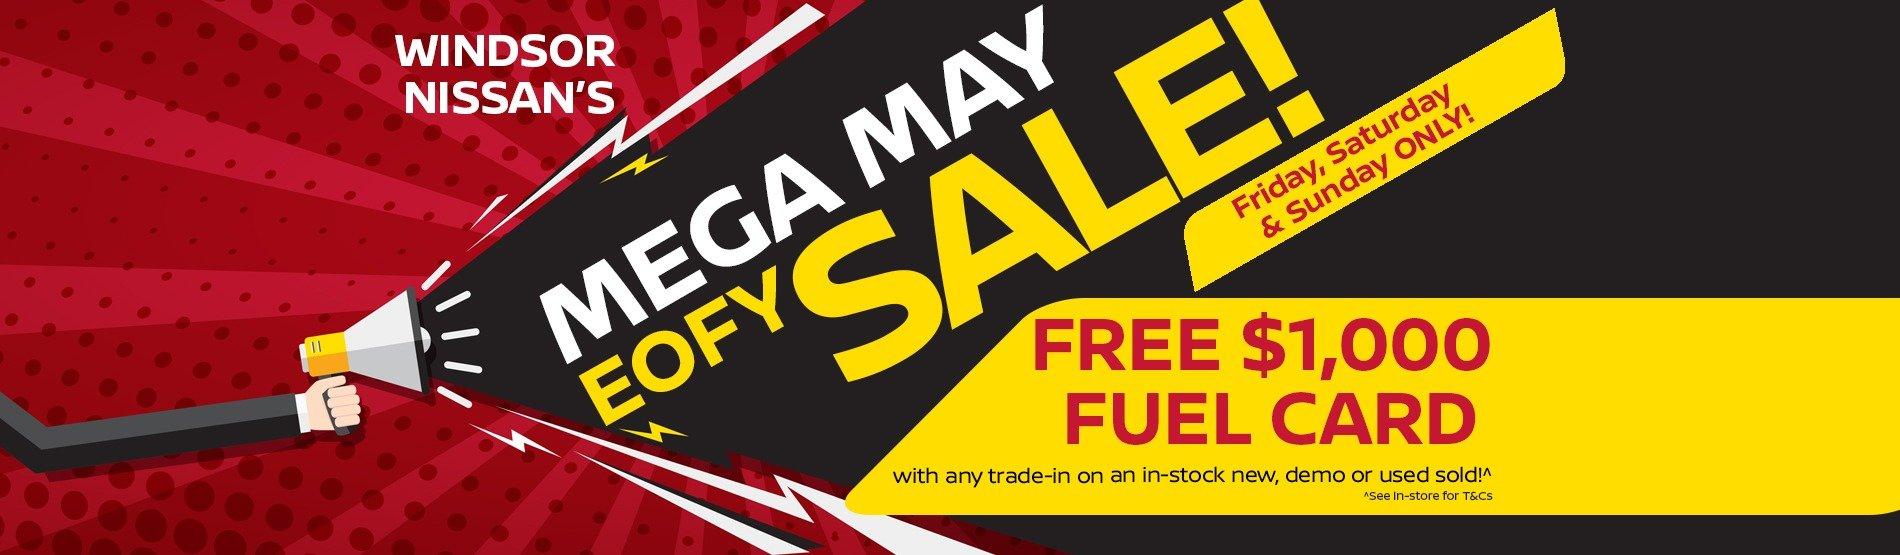 Windsor Nissan EOFY Sale!